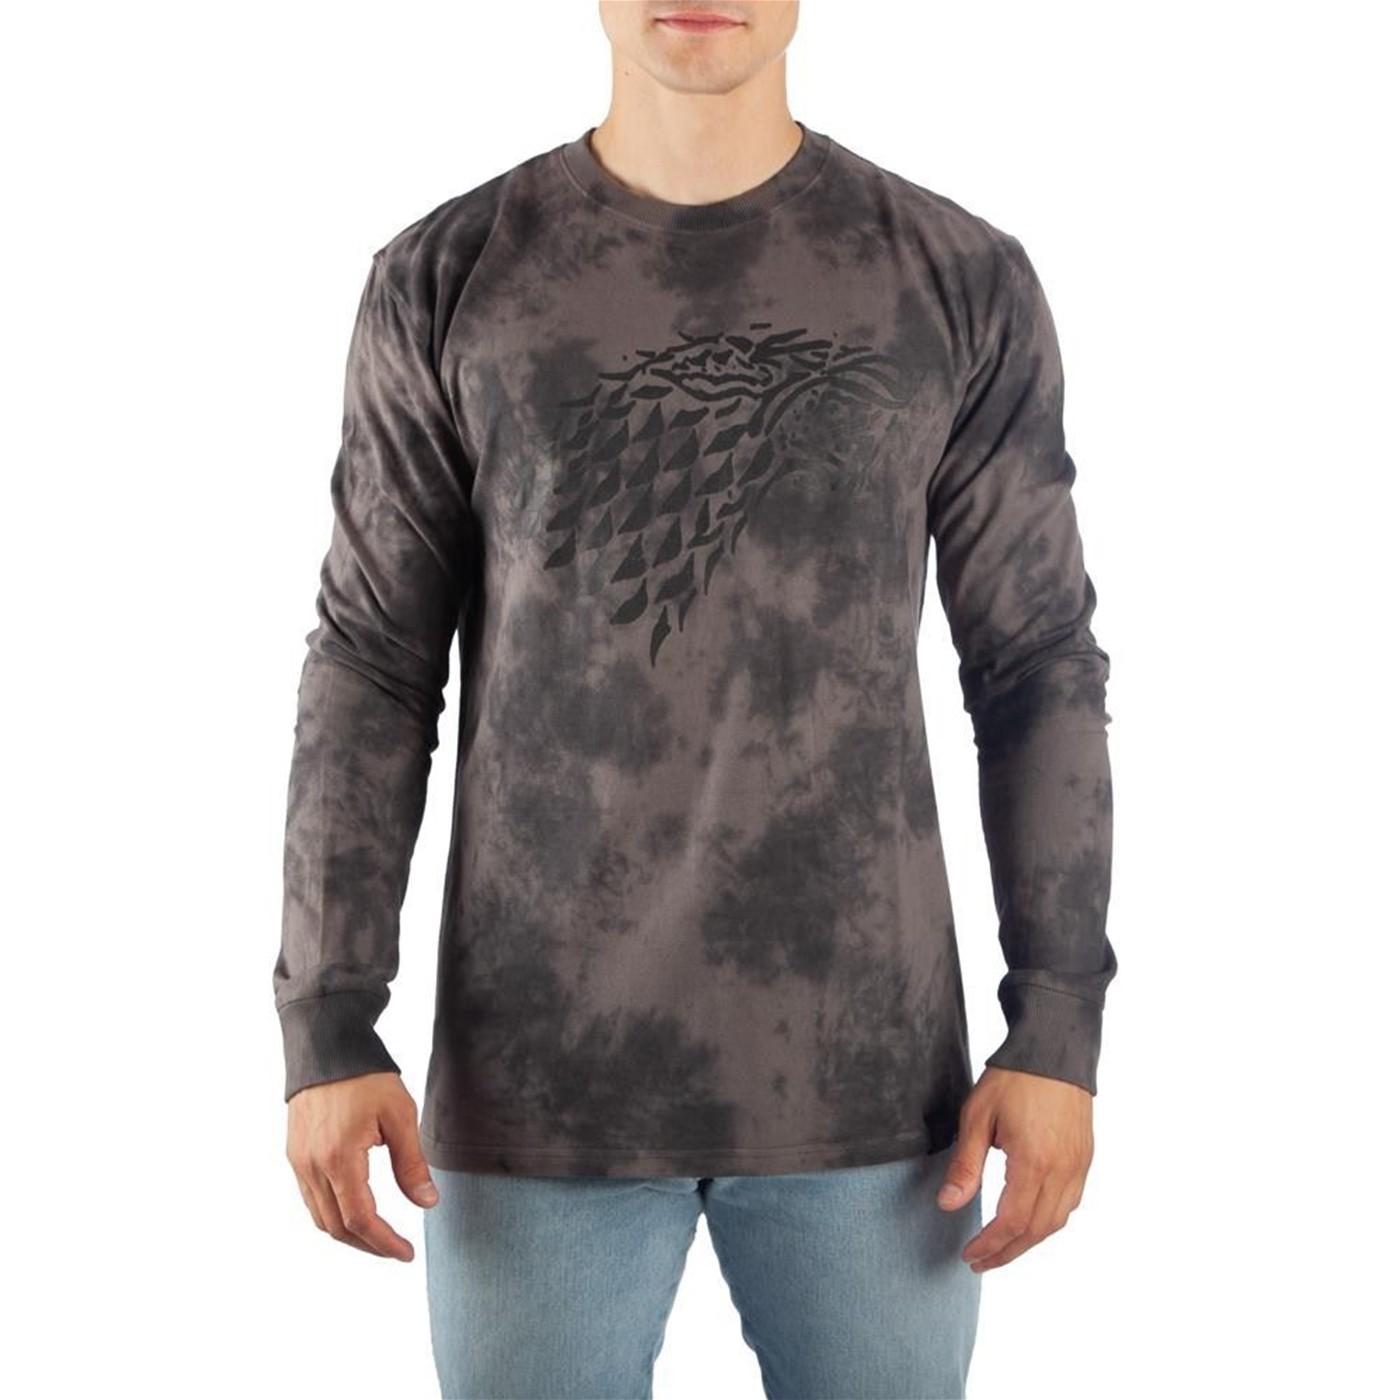 Game of Thrones Stark Long Sleeve Acid Wash T-Shirt